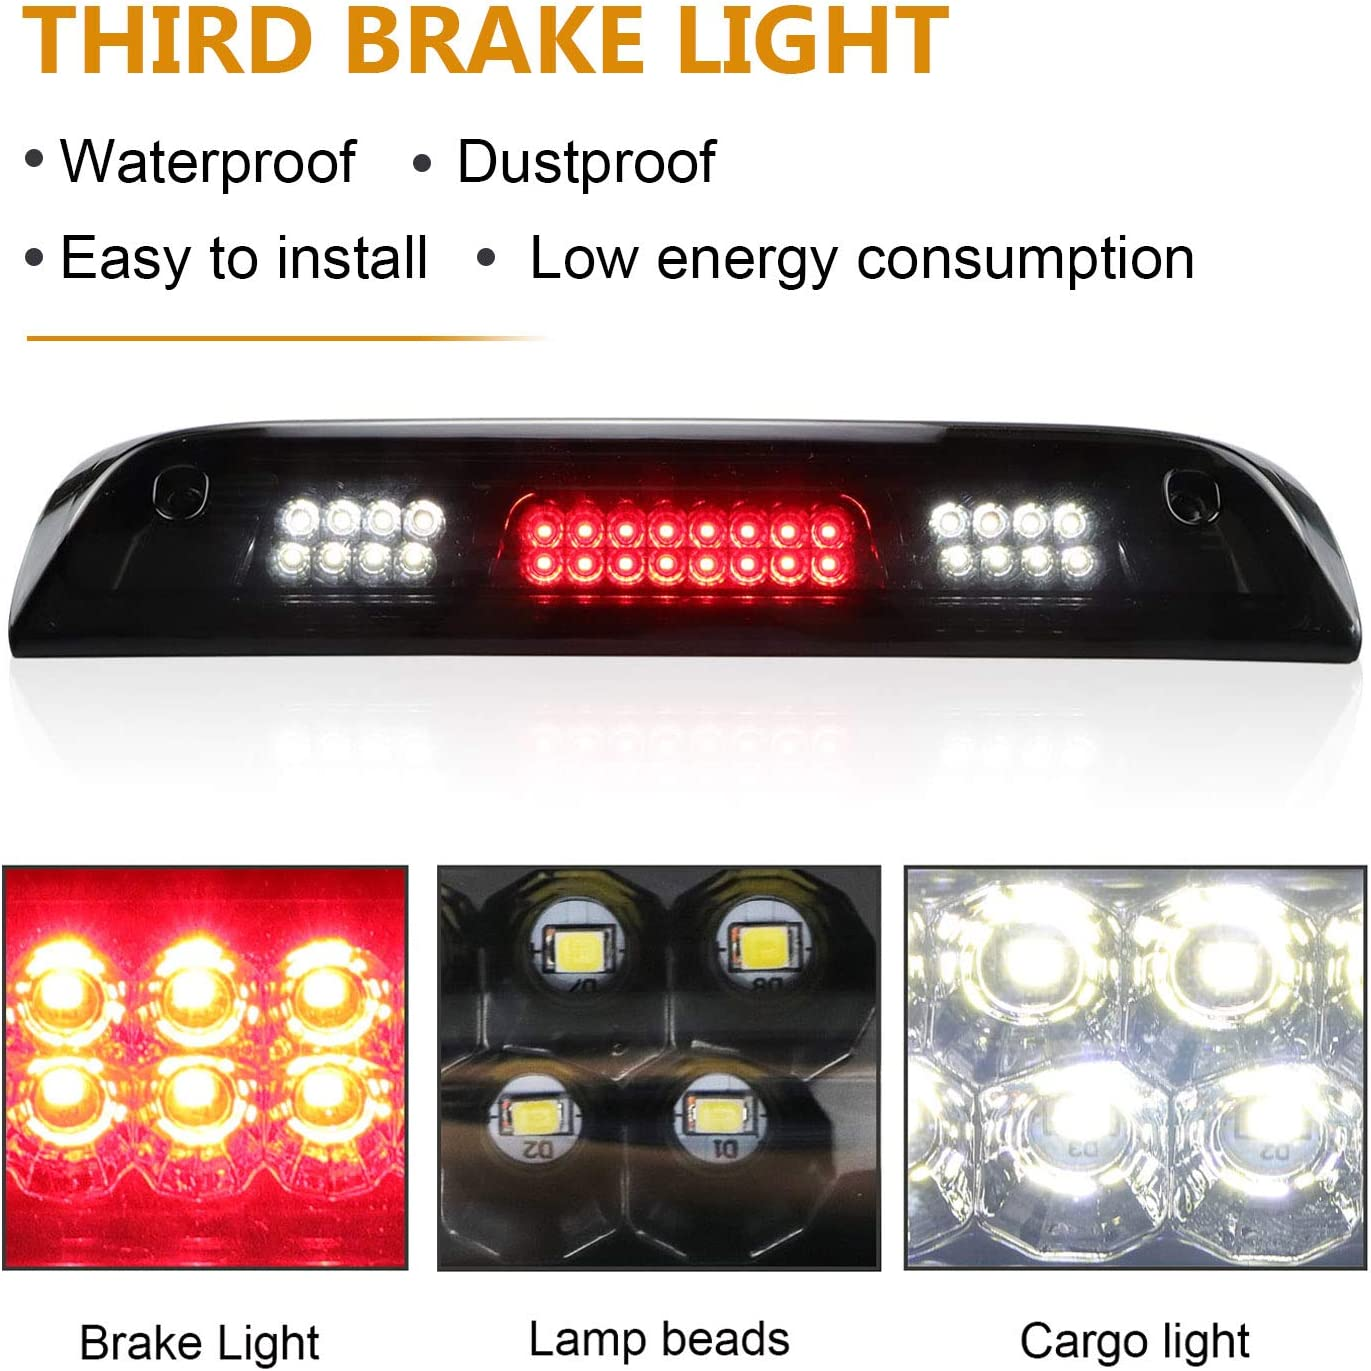 Cargo Light Center High Mount Lamp Light LED Third 3rd Brake Light Compatible With 14-18 GMC Sierra Chevy Silverado 1500 2500 HD 3500 HD Smoked Lens